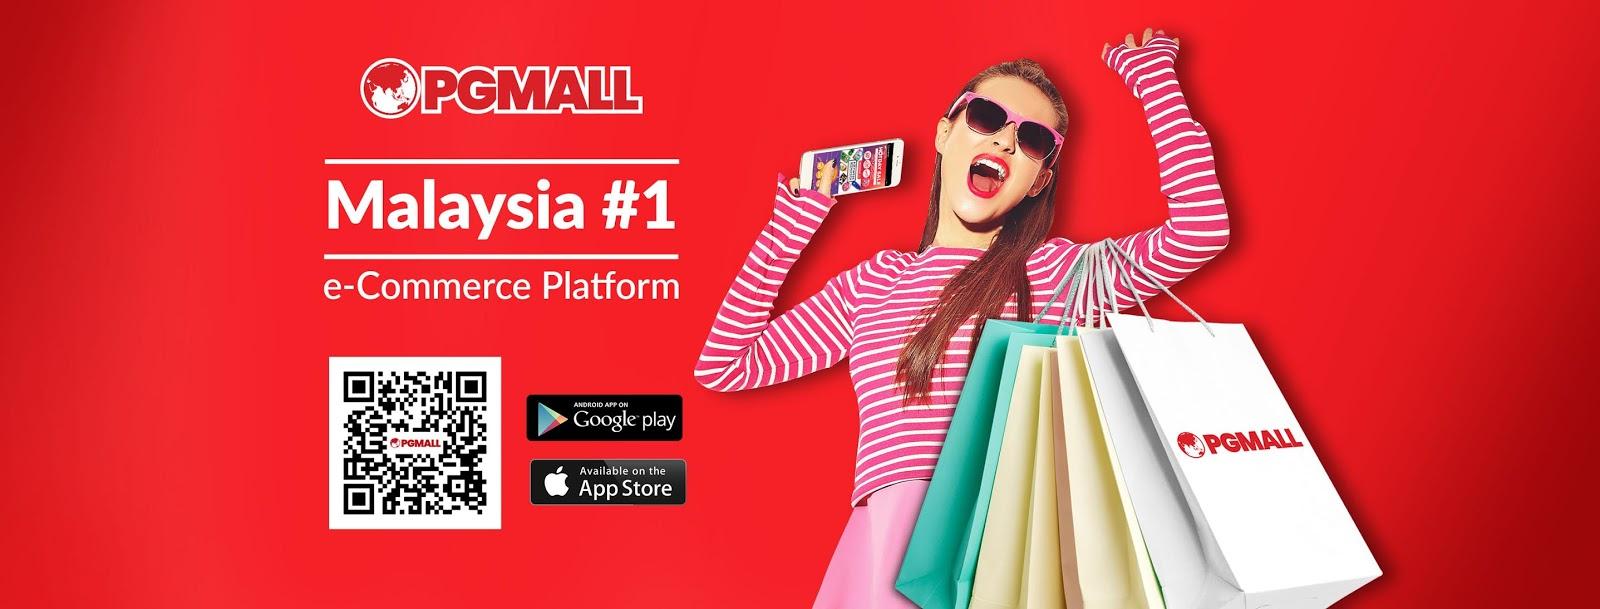 Raya ready with PGMall!